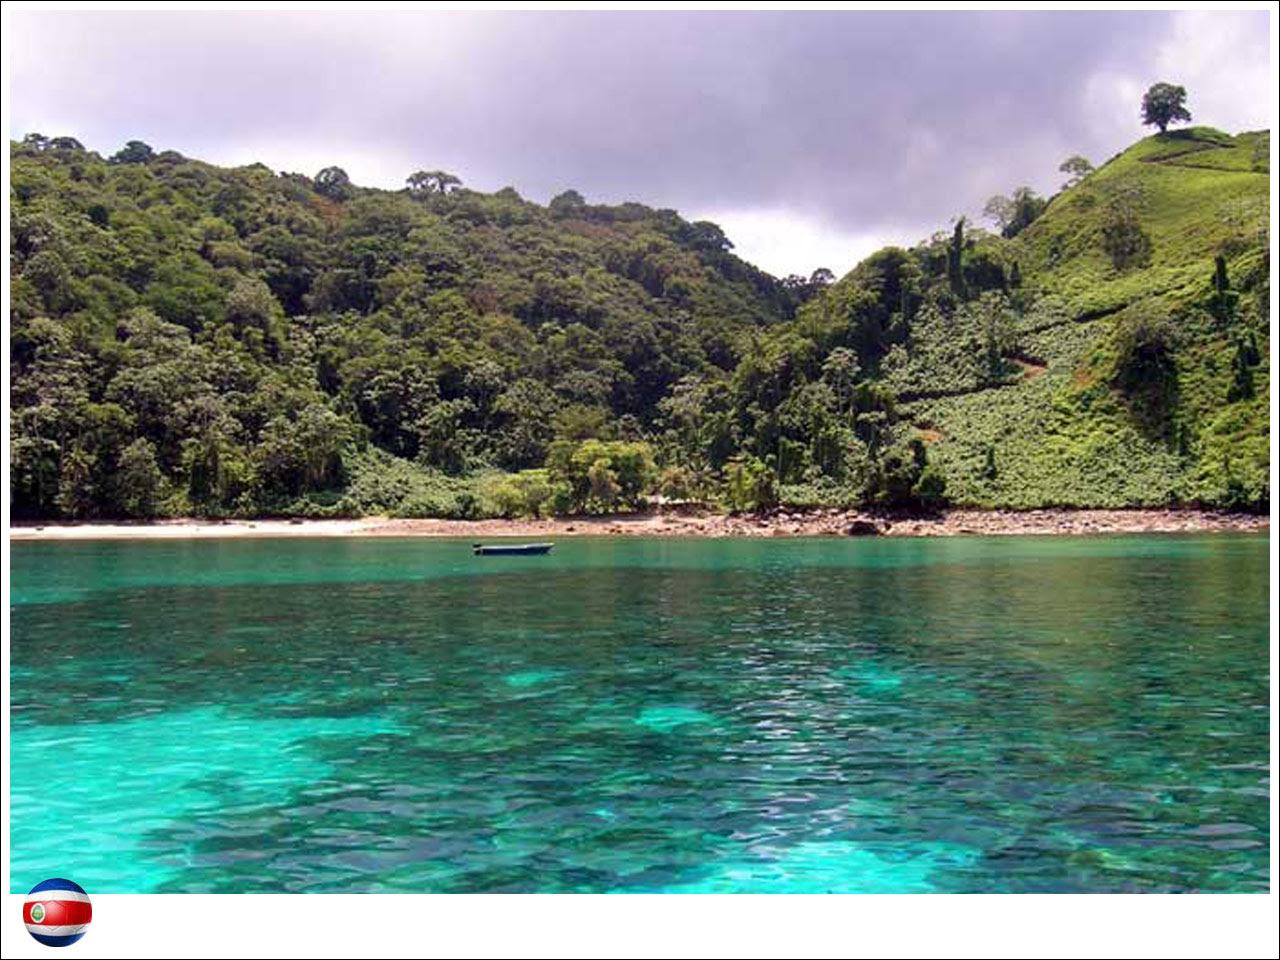 copa-protegida-costa-rica-08